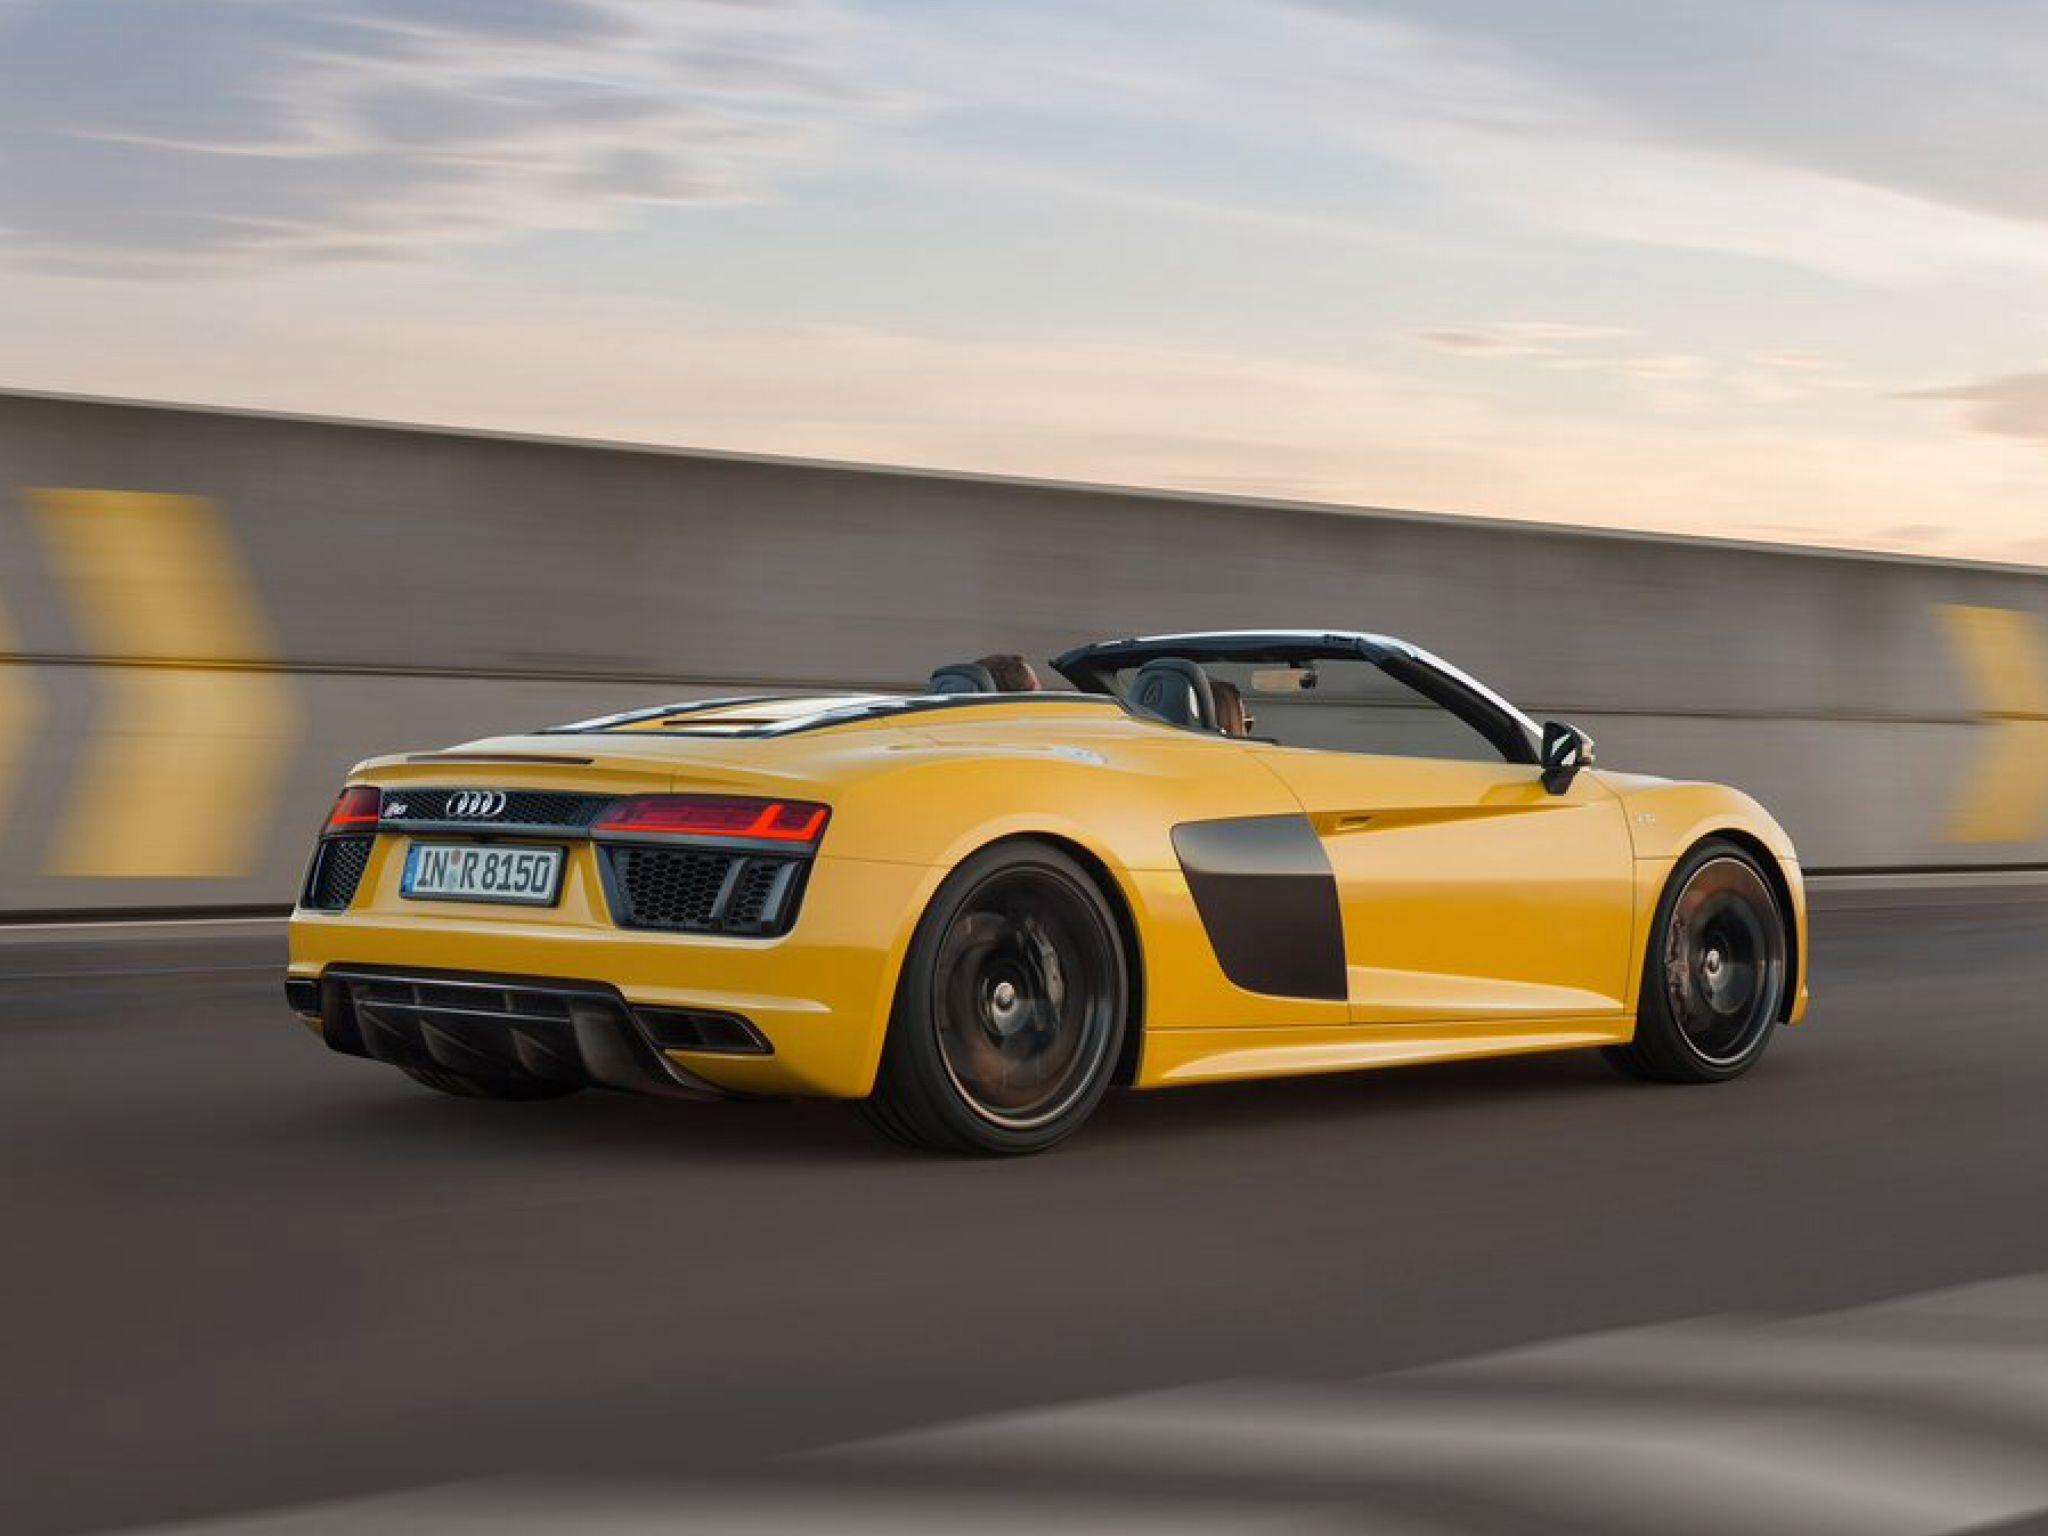 1db181ff4836ca263f59c137162dfd34 Stunning Ficha Tecnica Porsche 918 Spyder Concept Cars Trend